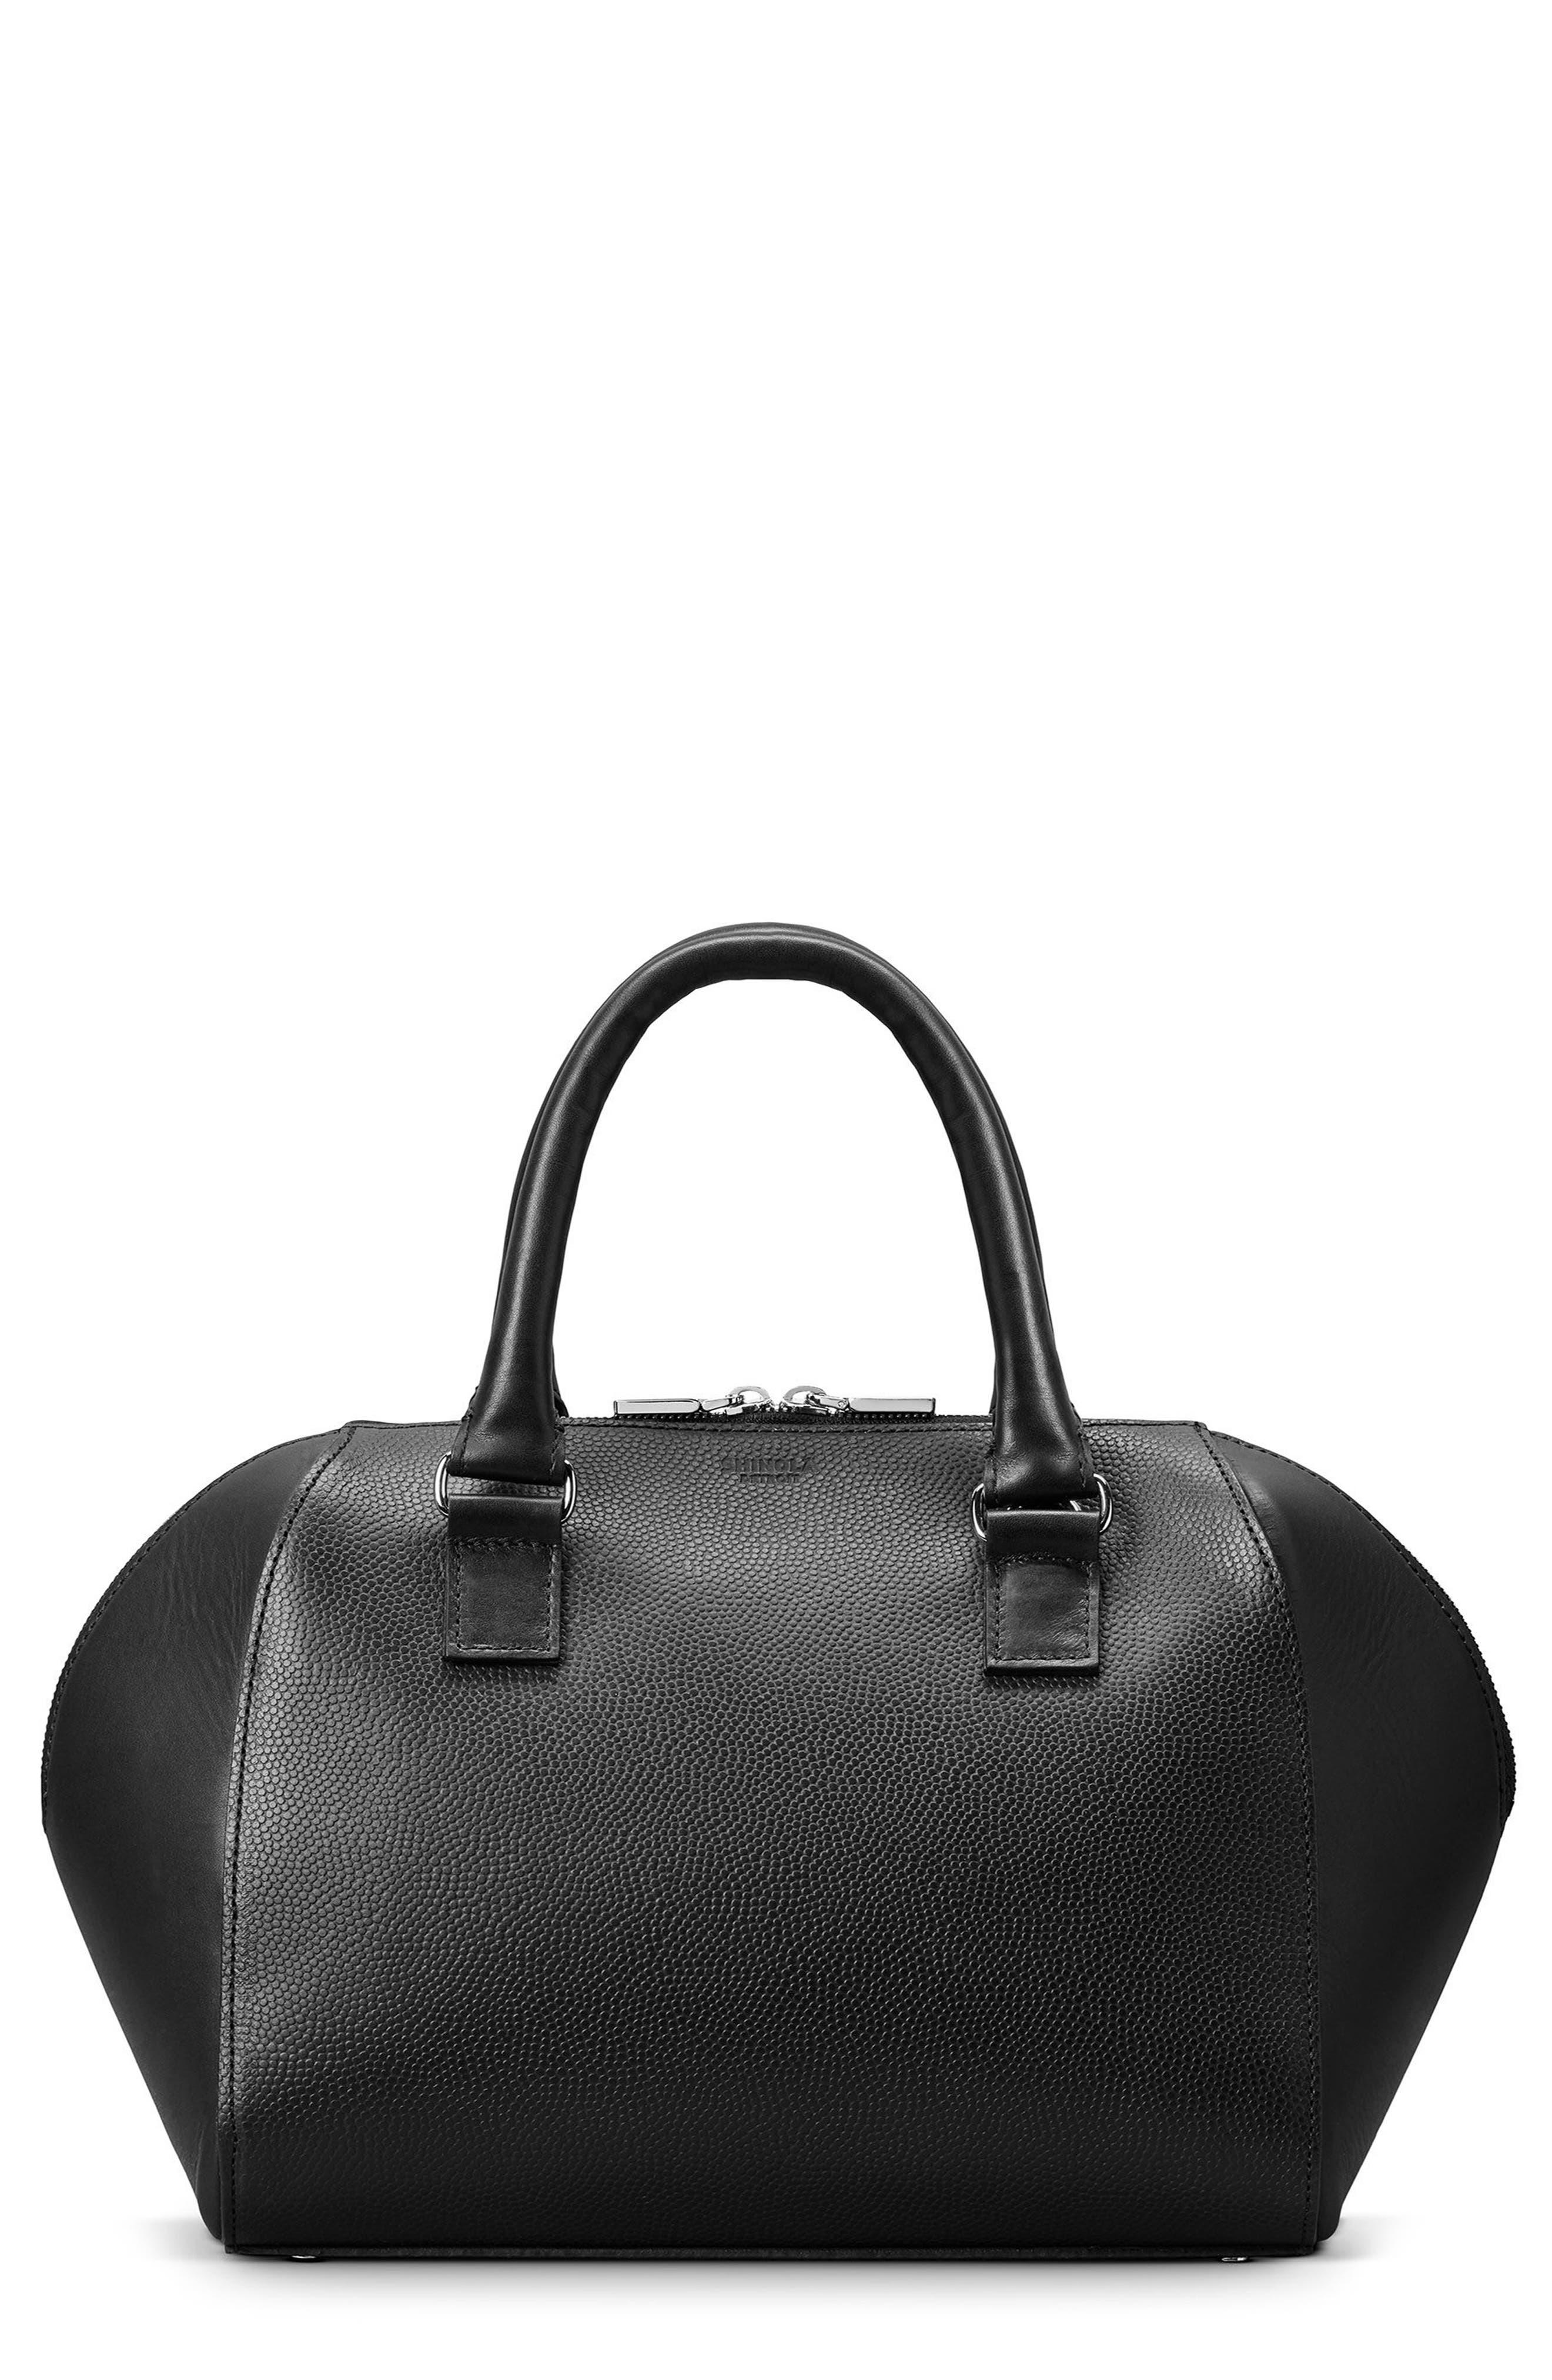 Shinola Latigo Leather Domed Satchel